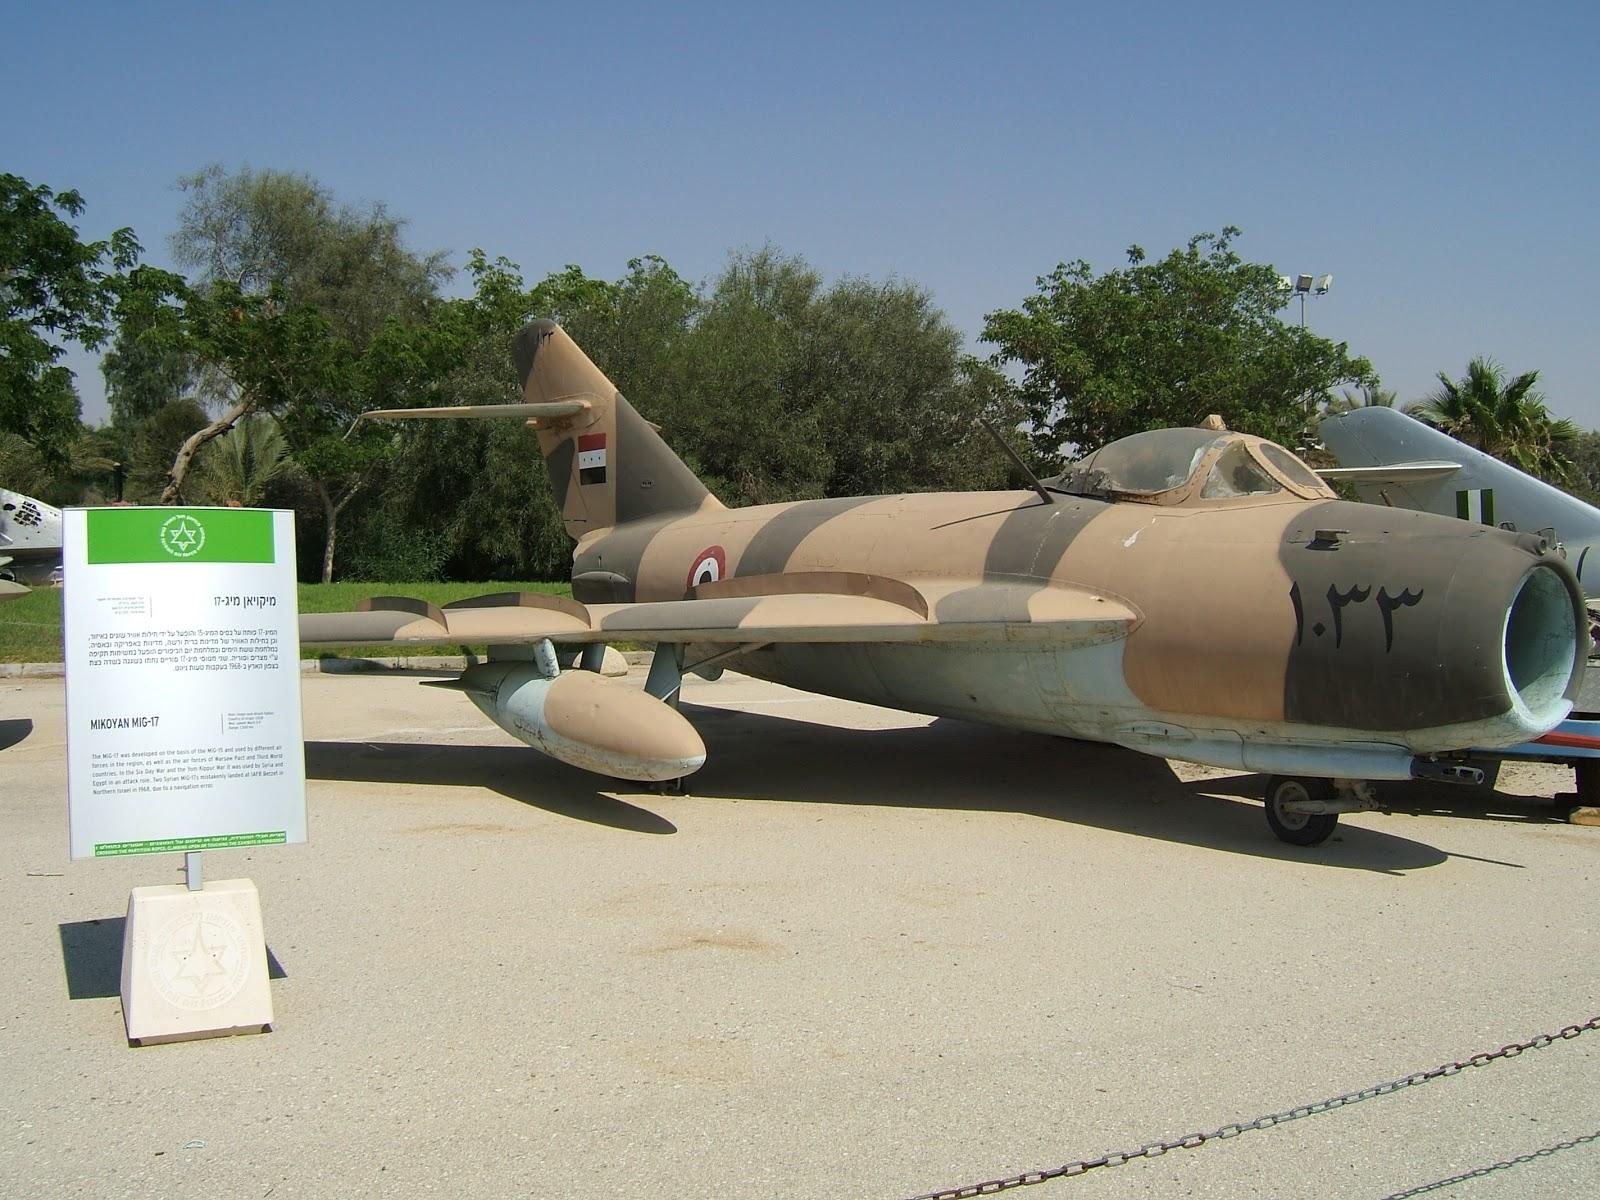 Betzet Israel  City pictures : Avions d'Israel / Aircraft from Israel: April 2013